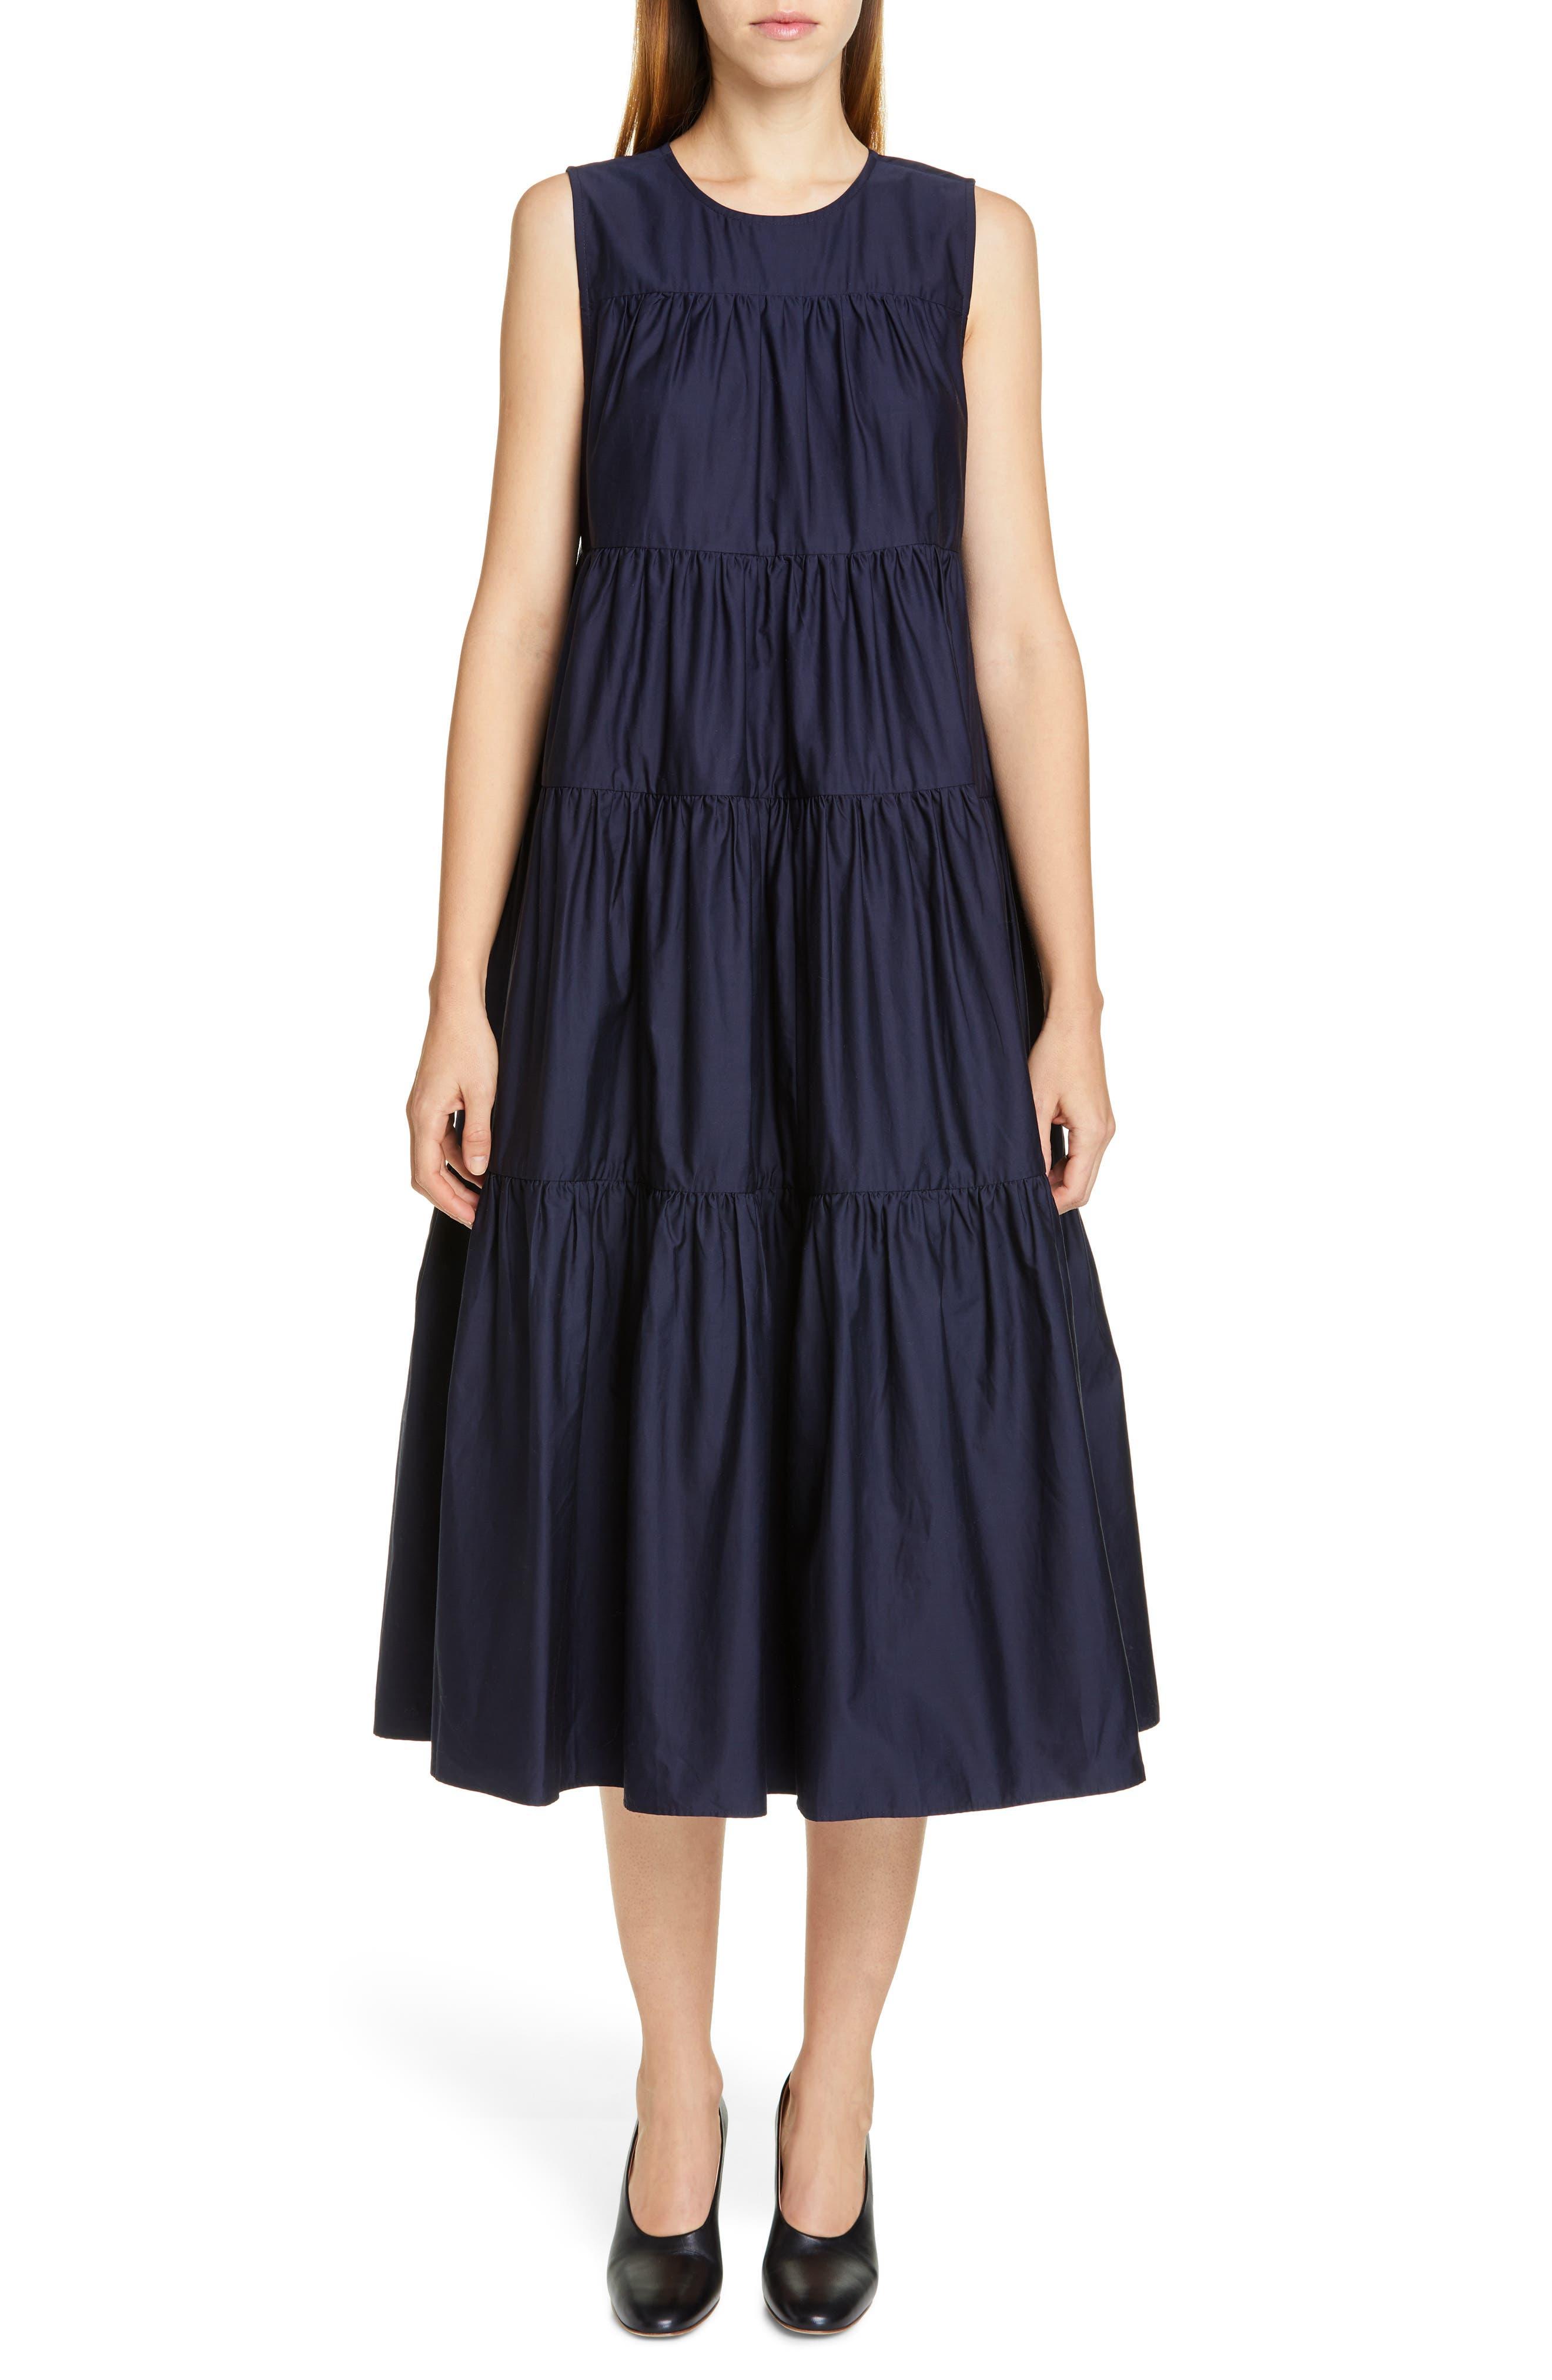 CO, Tiered Cotton Midi Dress, Main thumbnail 1, color, NAVY